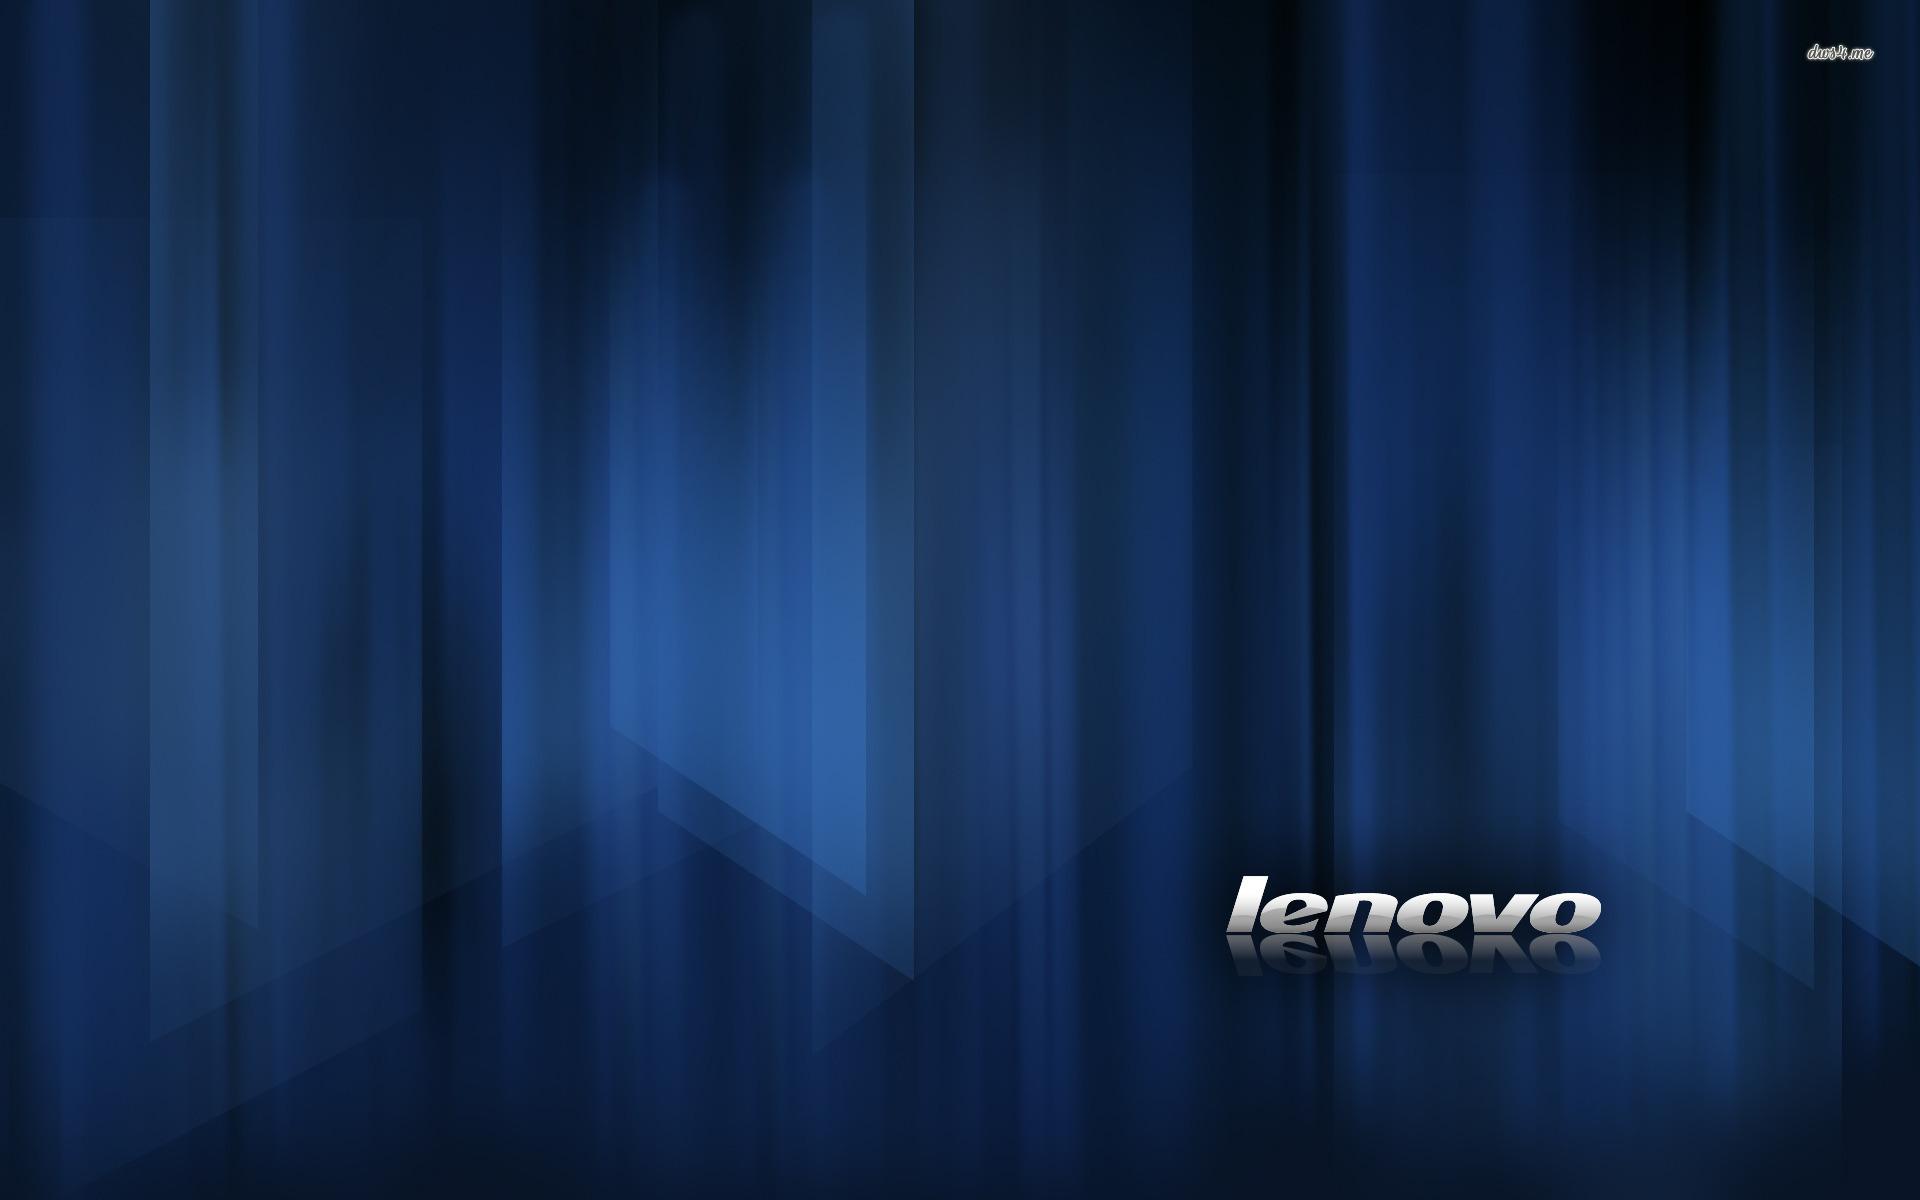 Lenovo wallpaper   Computer wallpapers   986 1920x1200